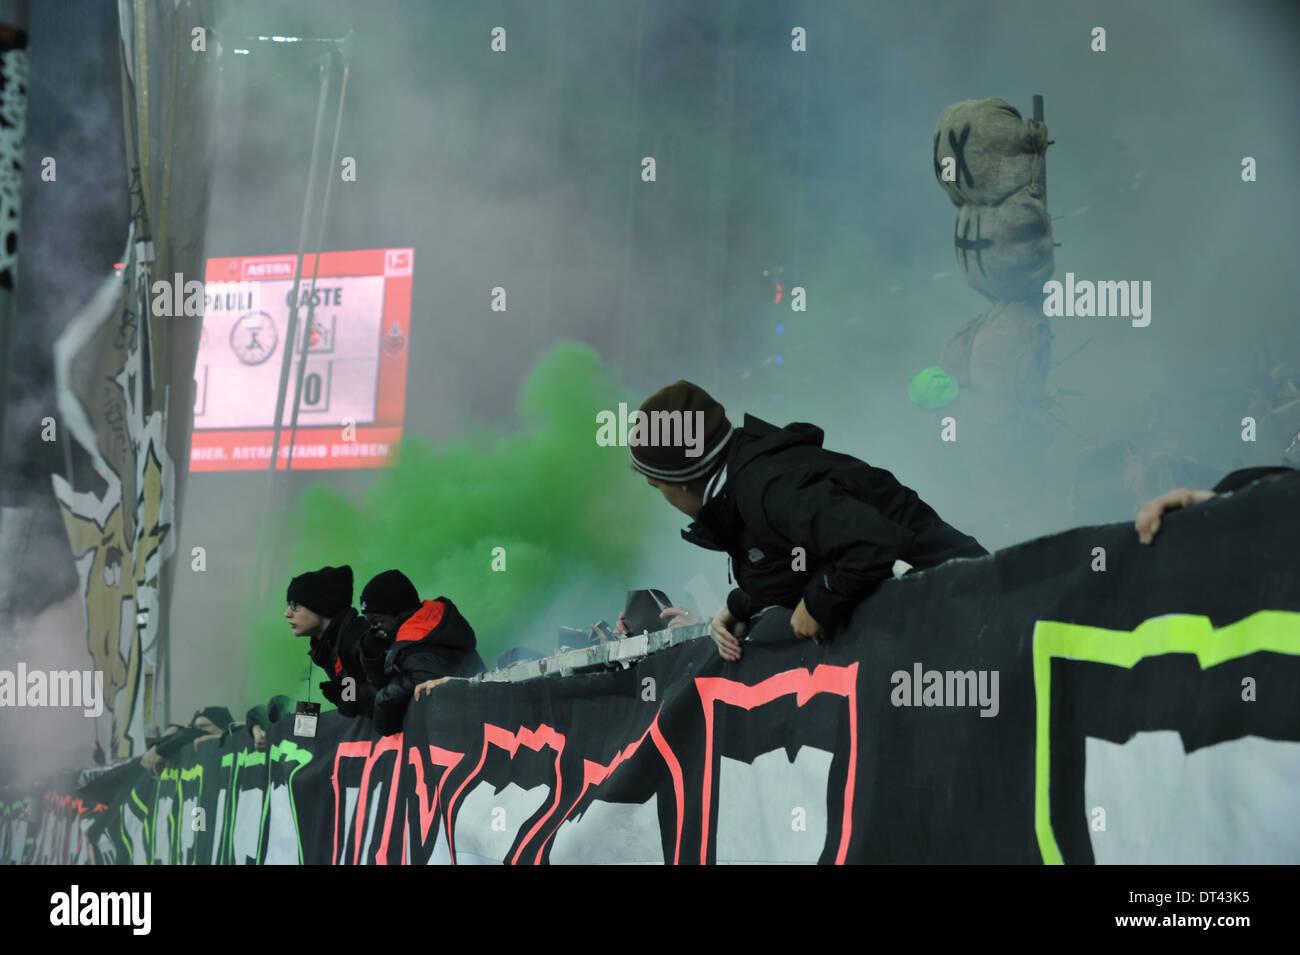 2. Bundesliga, FC St. Pauli vs. 1. FC Köln, Hamburg, Bengalos in der Südkurve vor dem Spiel. Editorial use only. - Stock Image